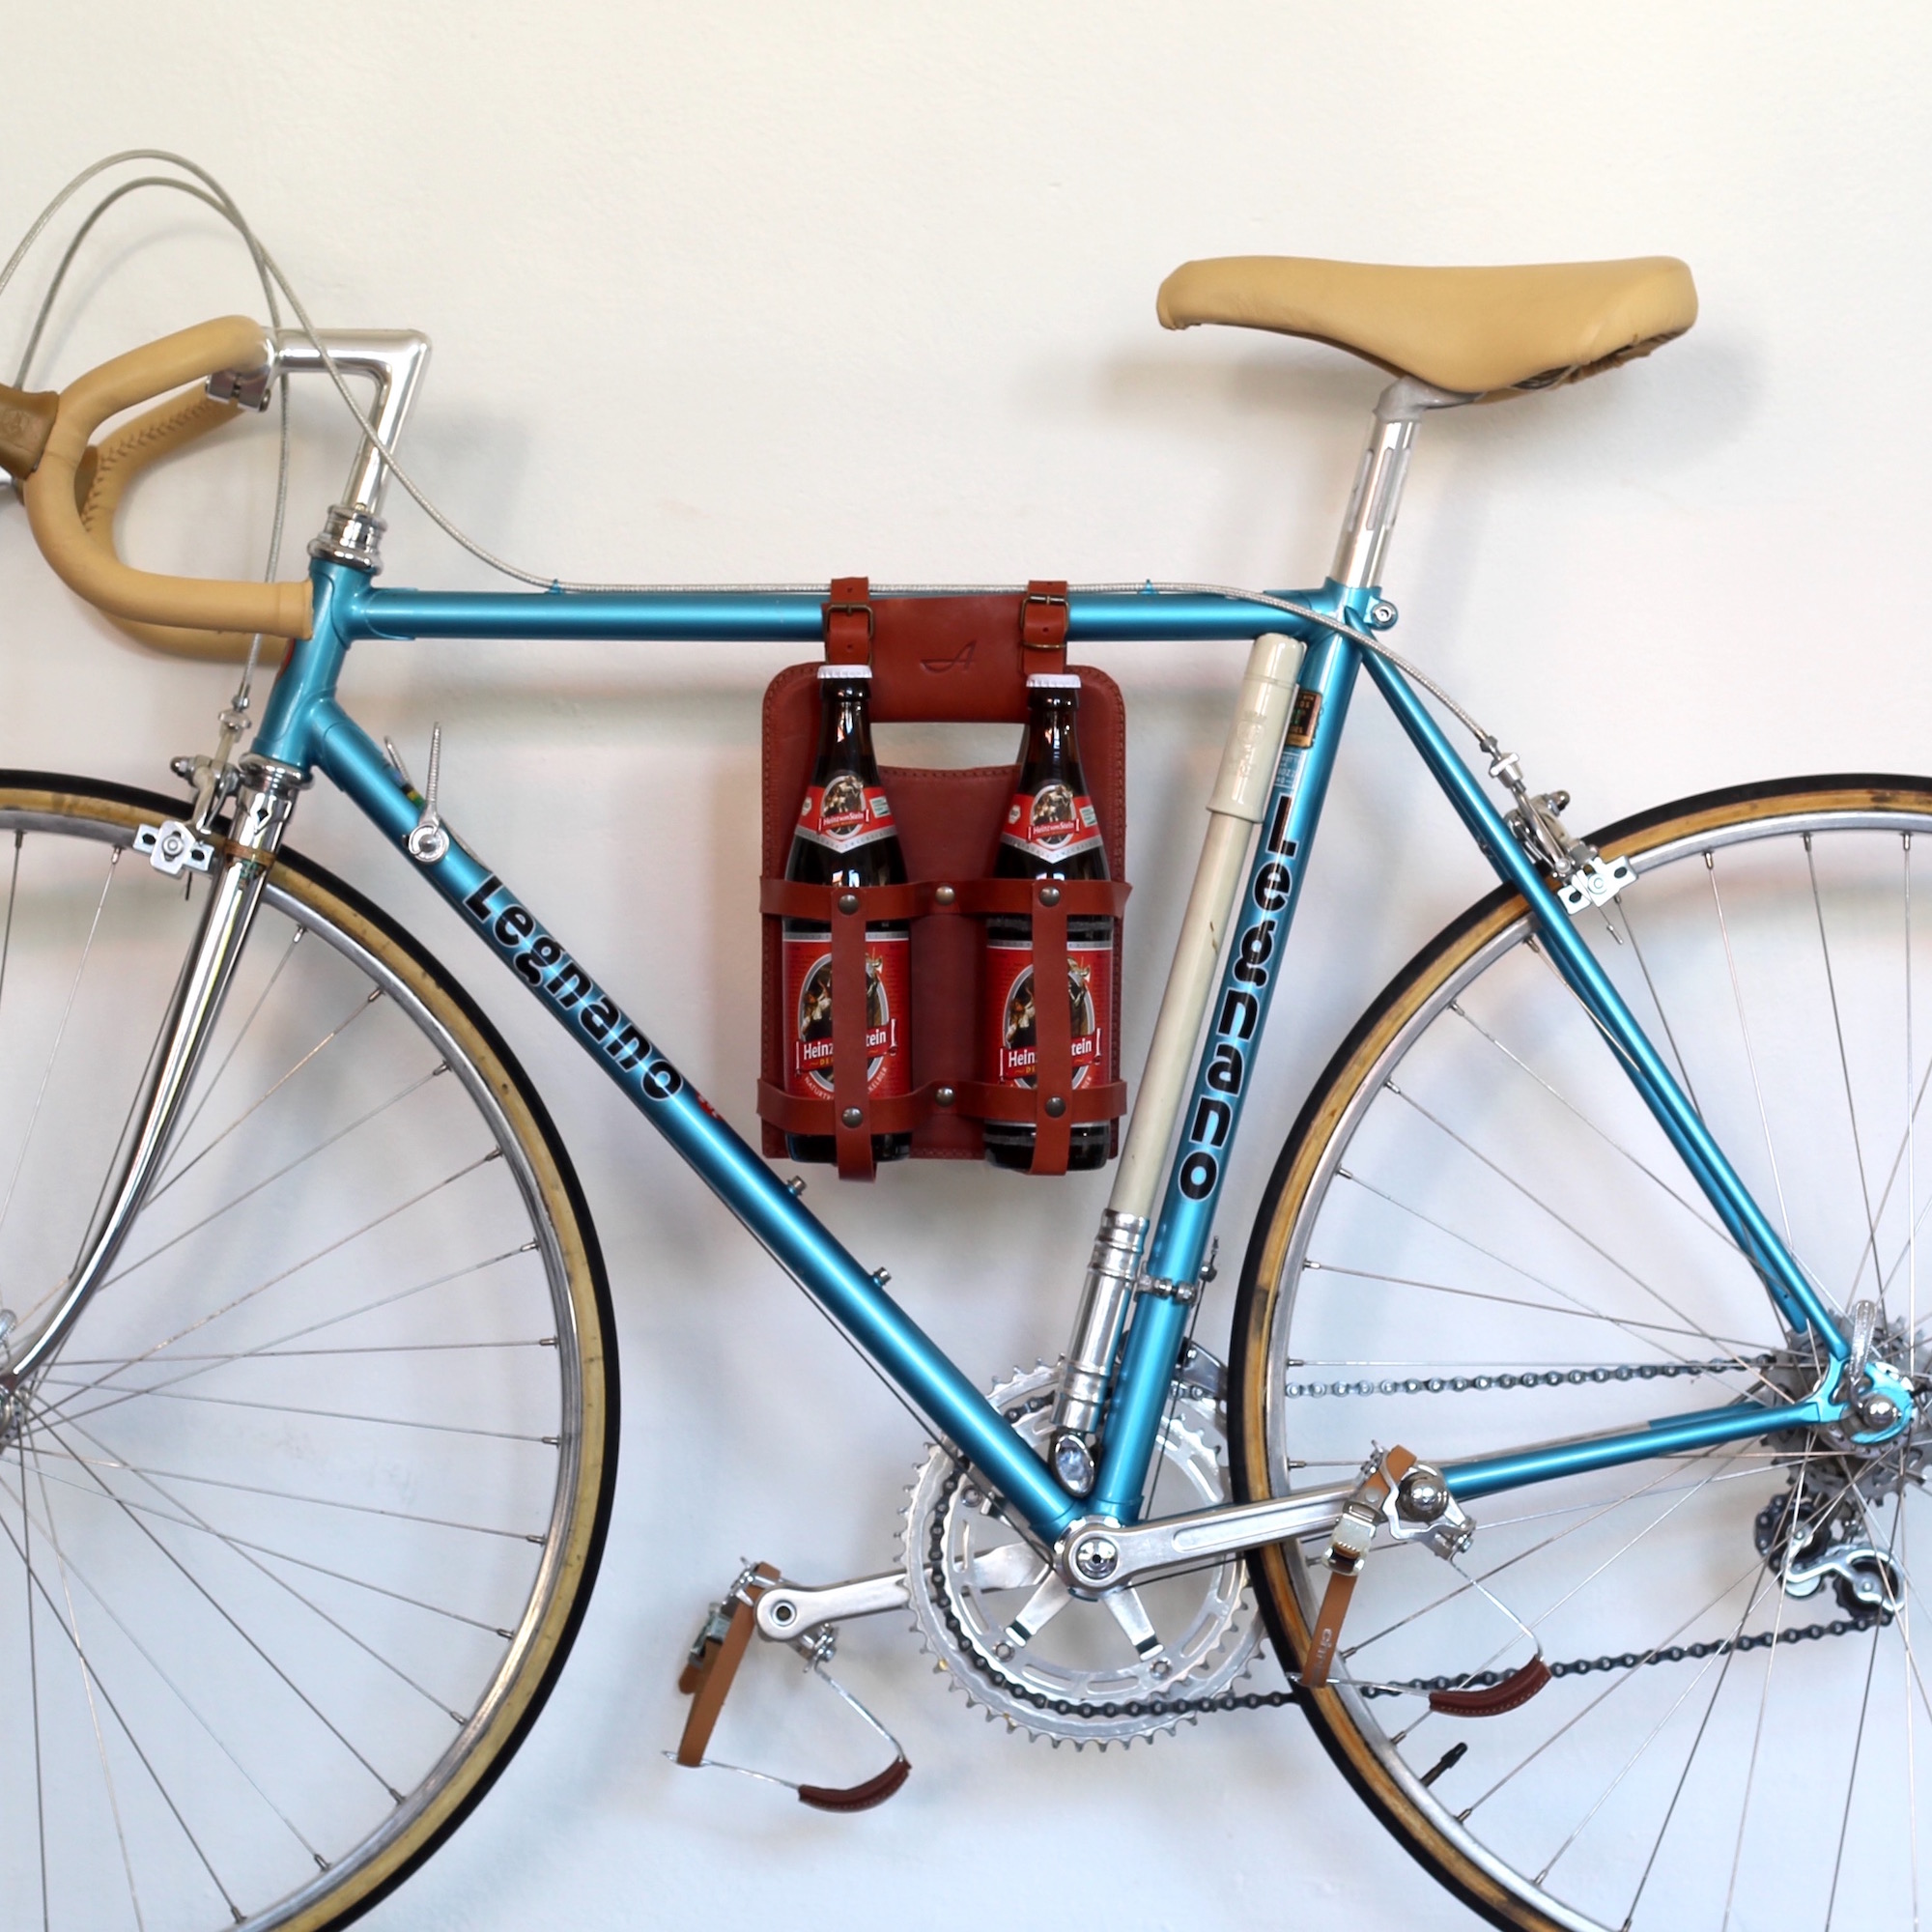 atelier dissegna fahrrad flaschenhalter 0 5l seestrasse7. Black Bedroom Furniture Sets. Home Design Ideas